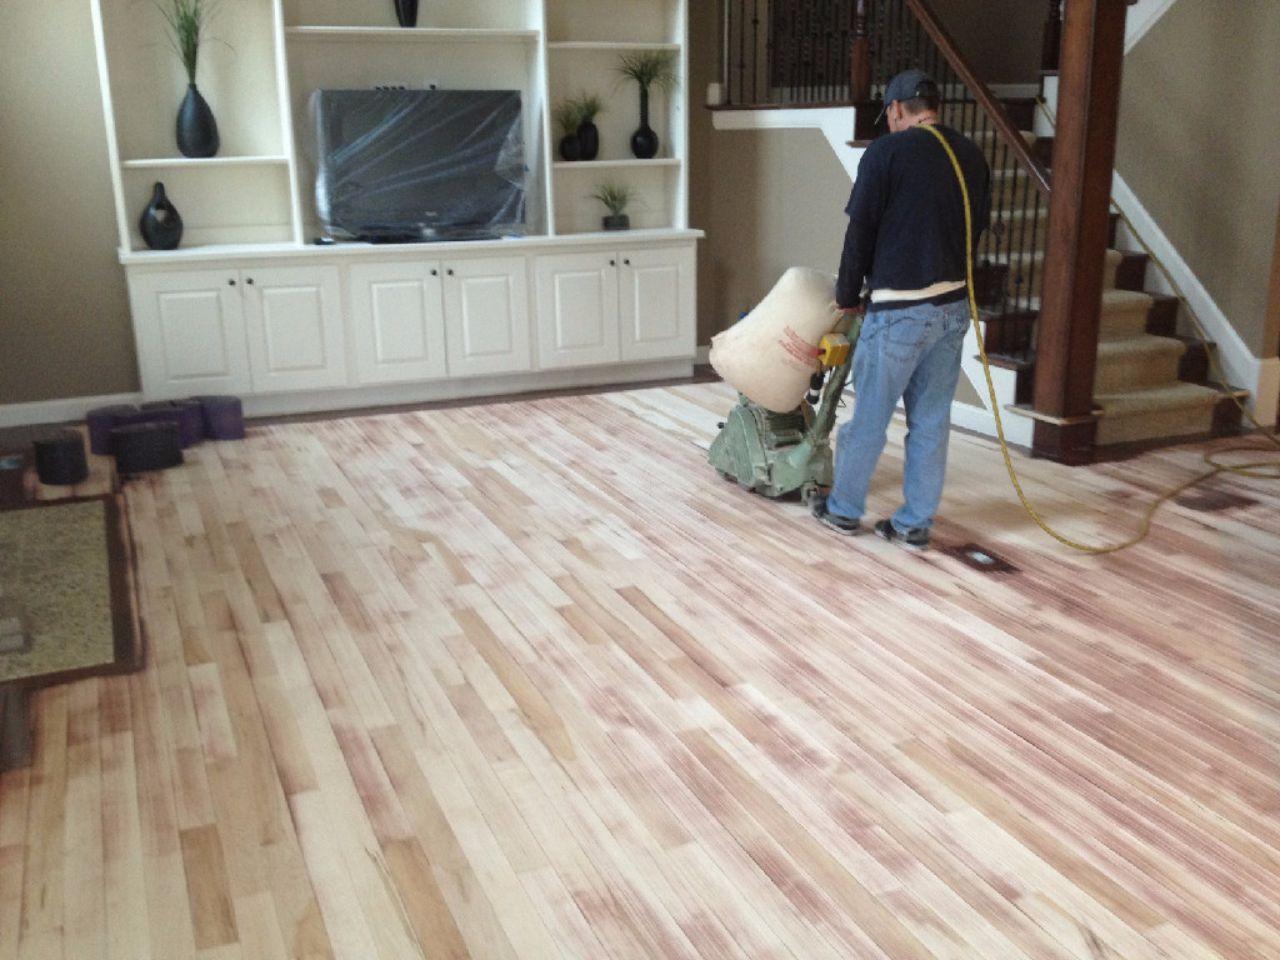 DIY Sanding Hardwood Floors  10 Tips on How to Sand Hardwood Floors DIY